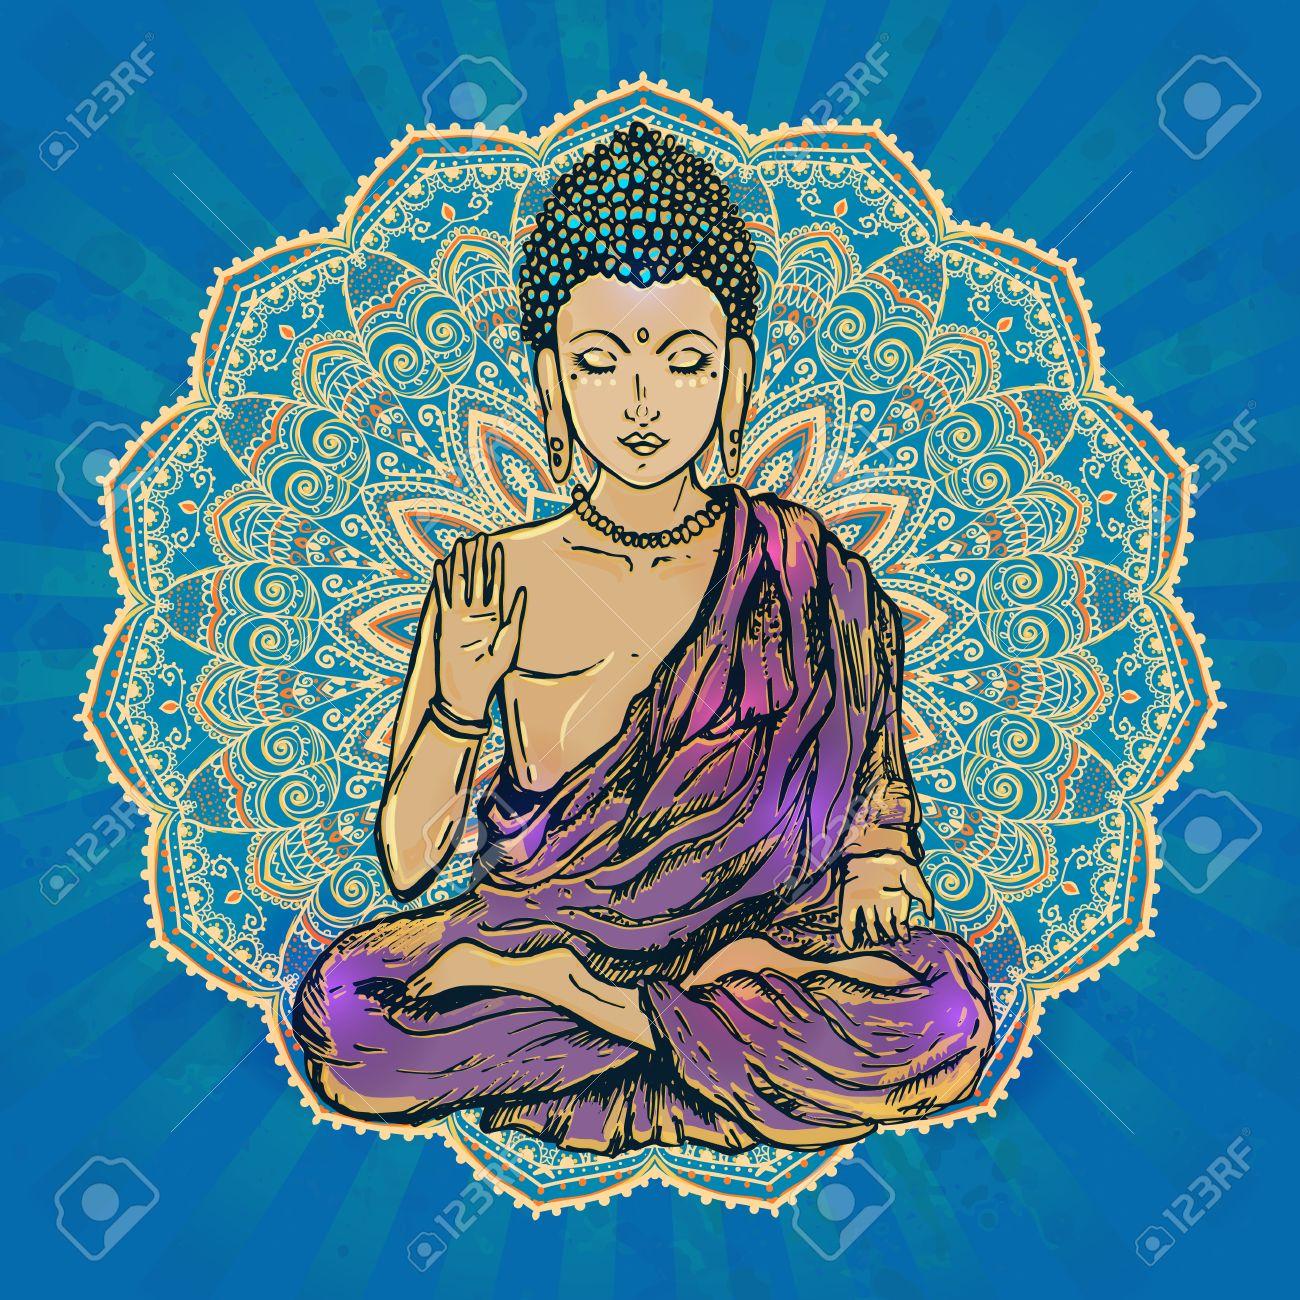 Buddha hand stock photos royalty free business images drawing of a buddha statue art illustration of gautama buddhism religion biocorpaavc Choice Image